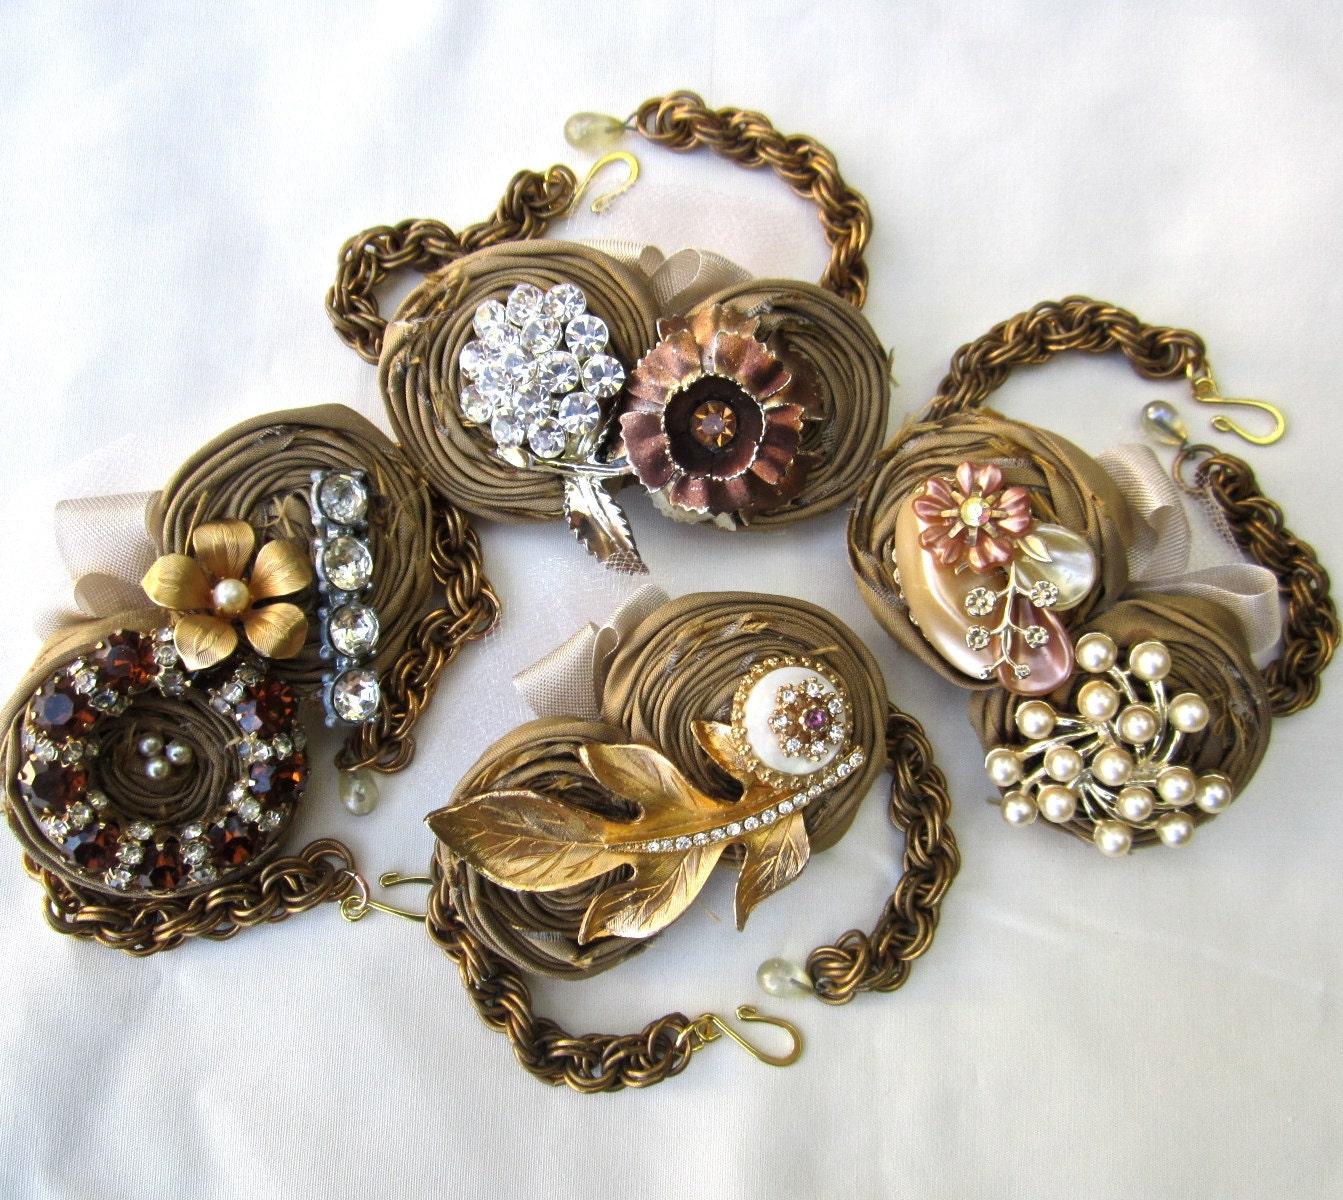 wrist corsage bridesmaid bracelets for weddings bridesmaid